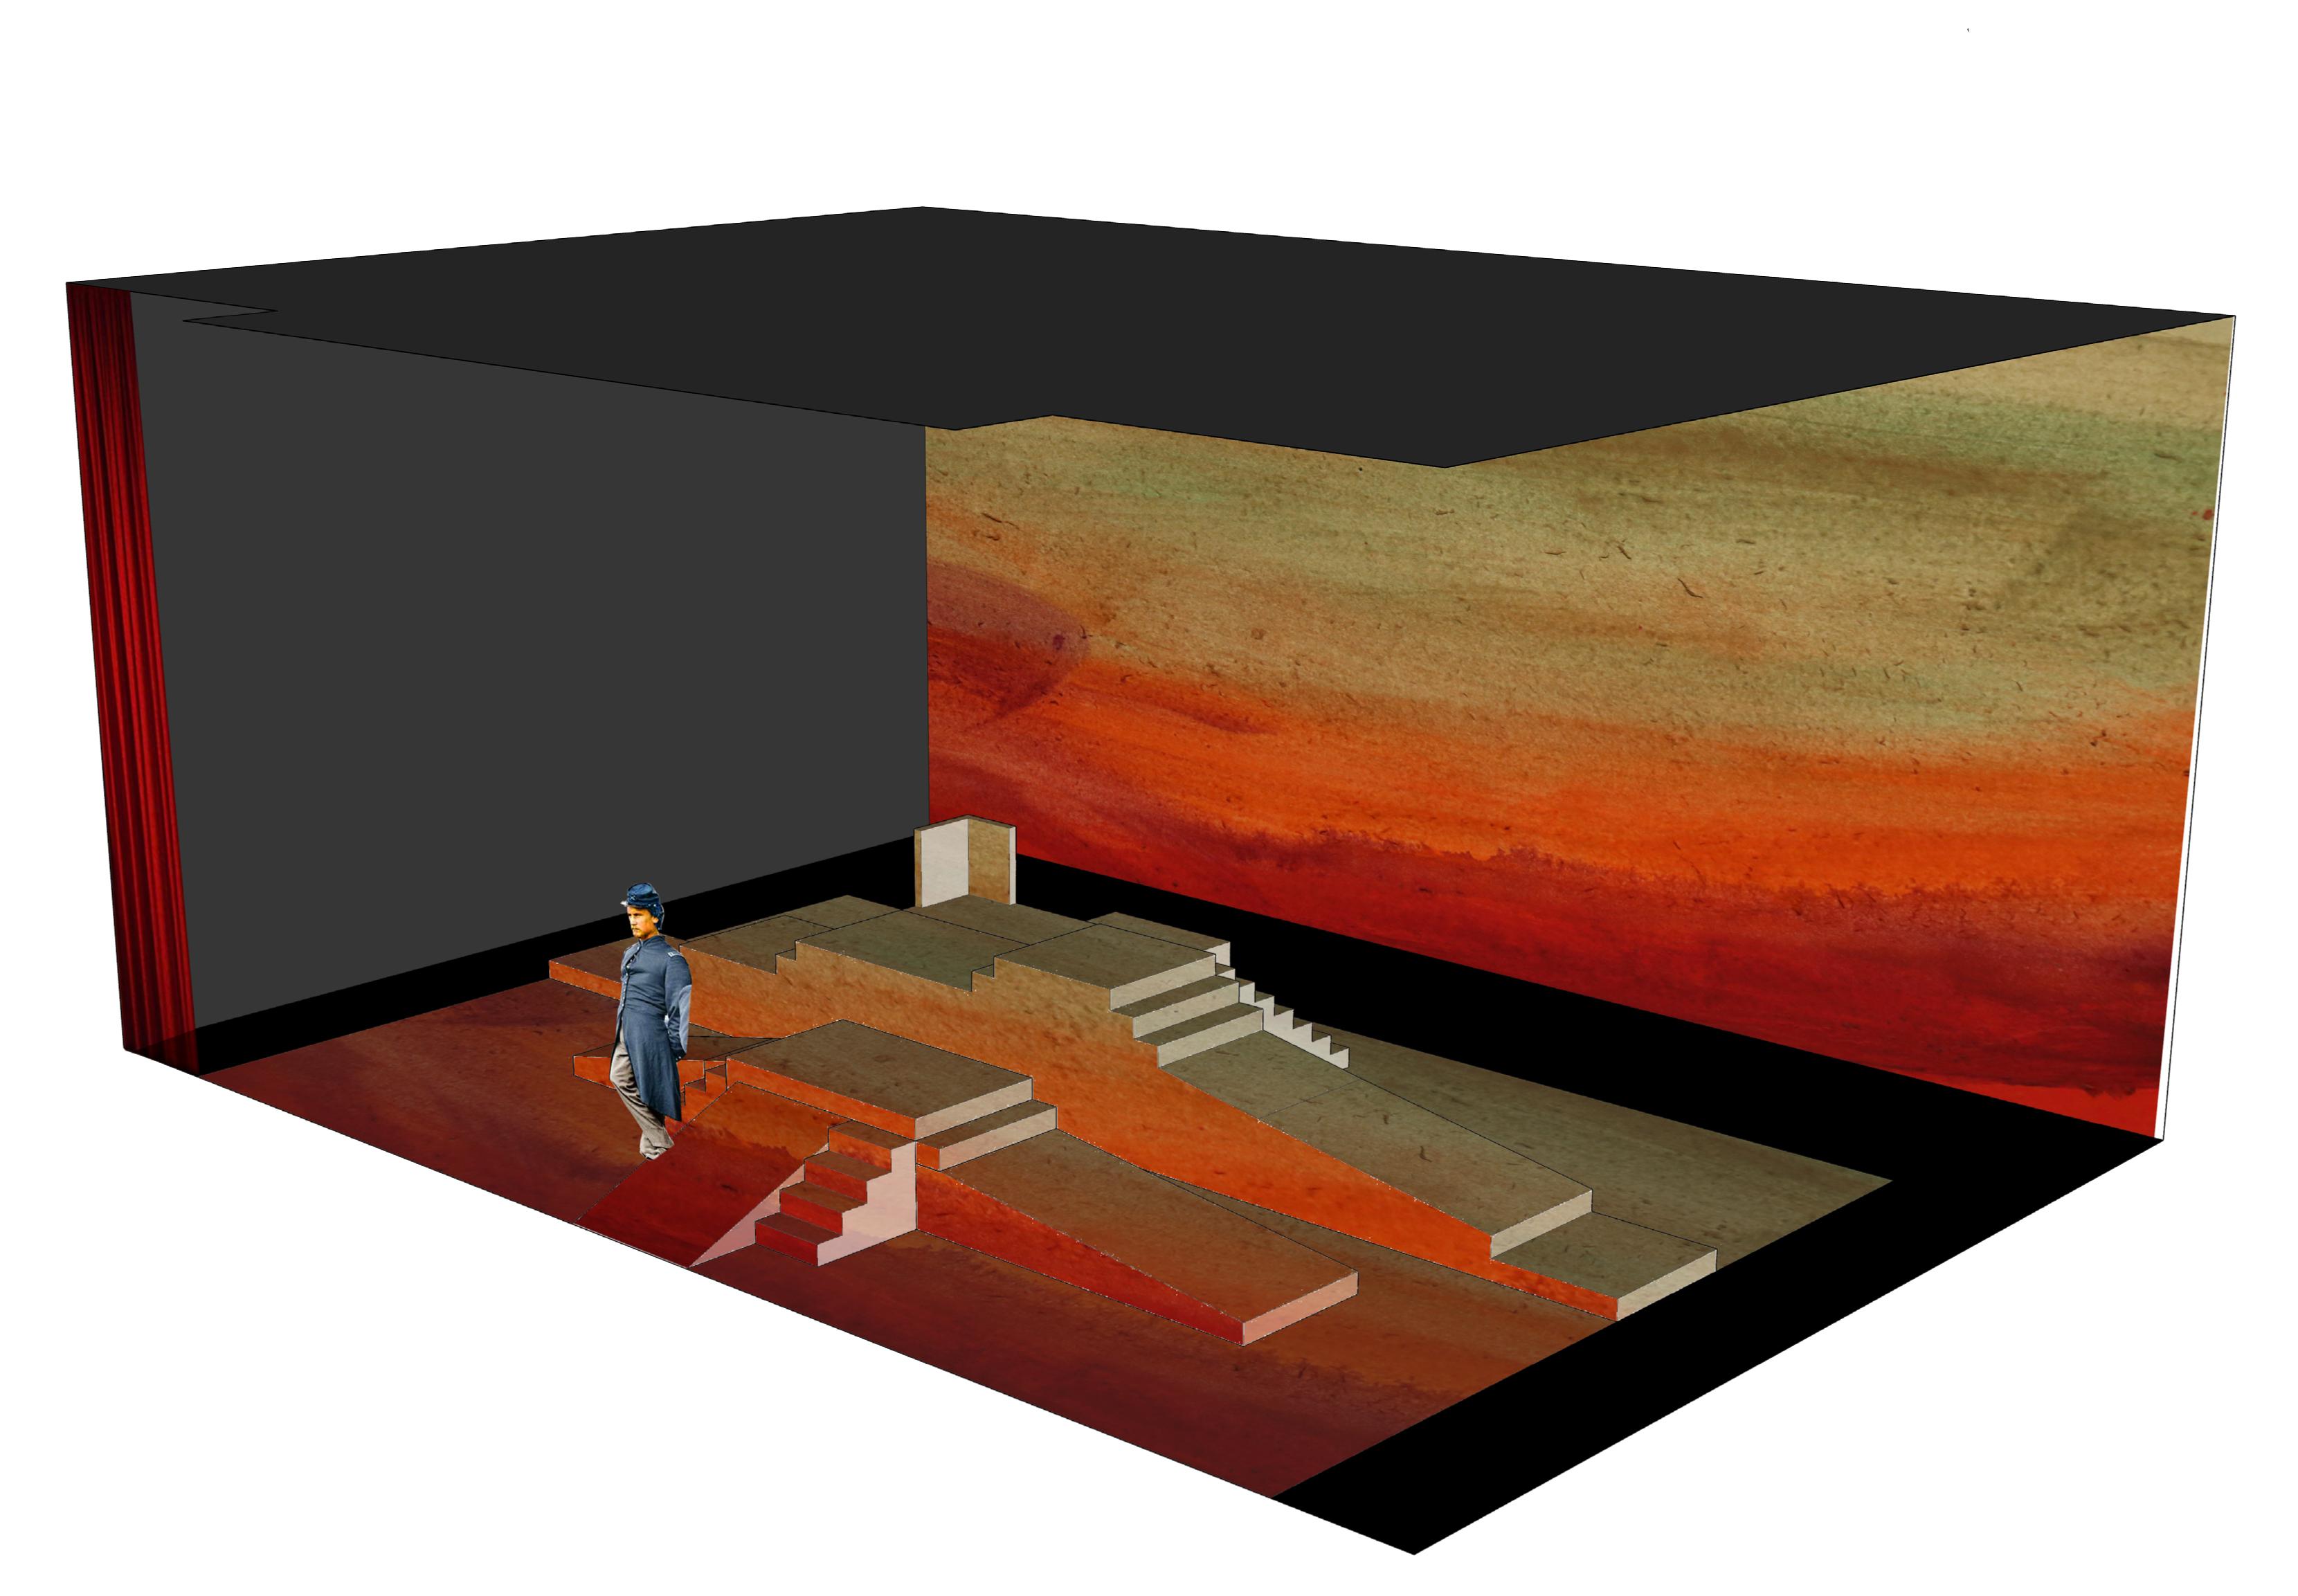 IL DESERTO DEI TARTARI - Rendering 1